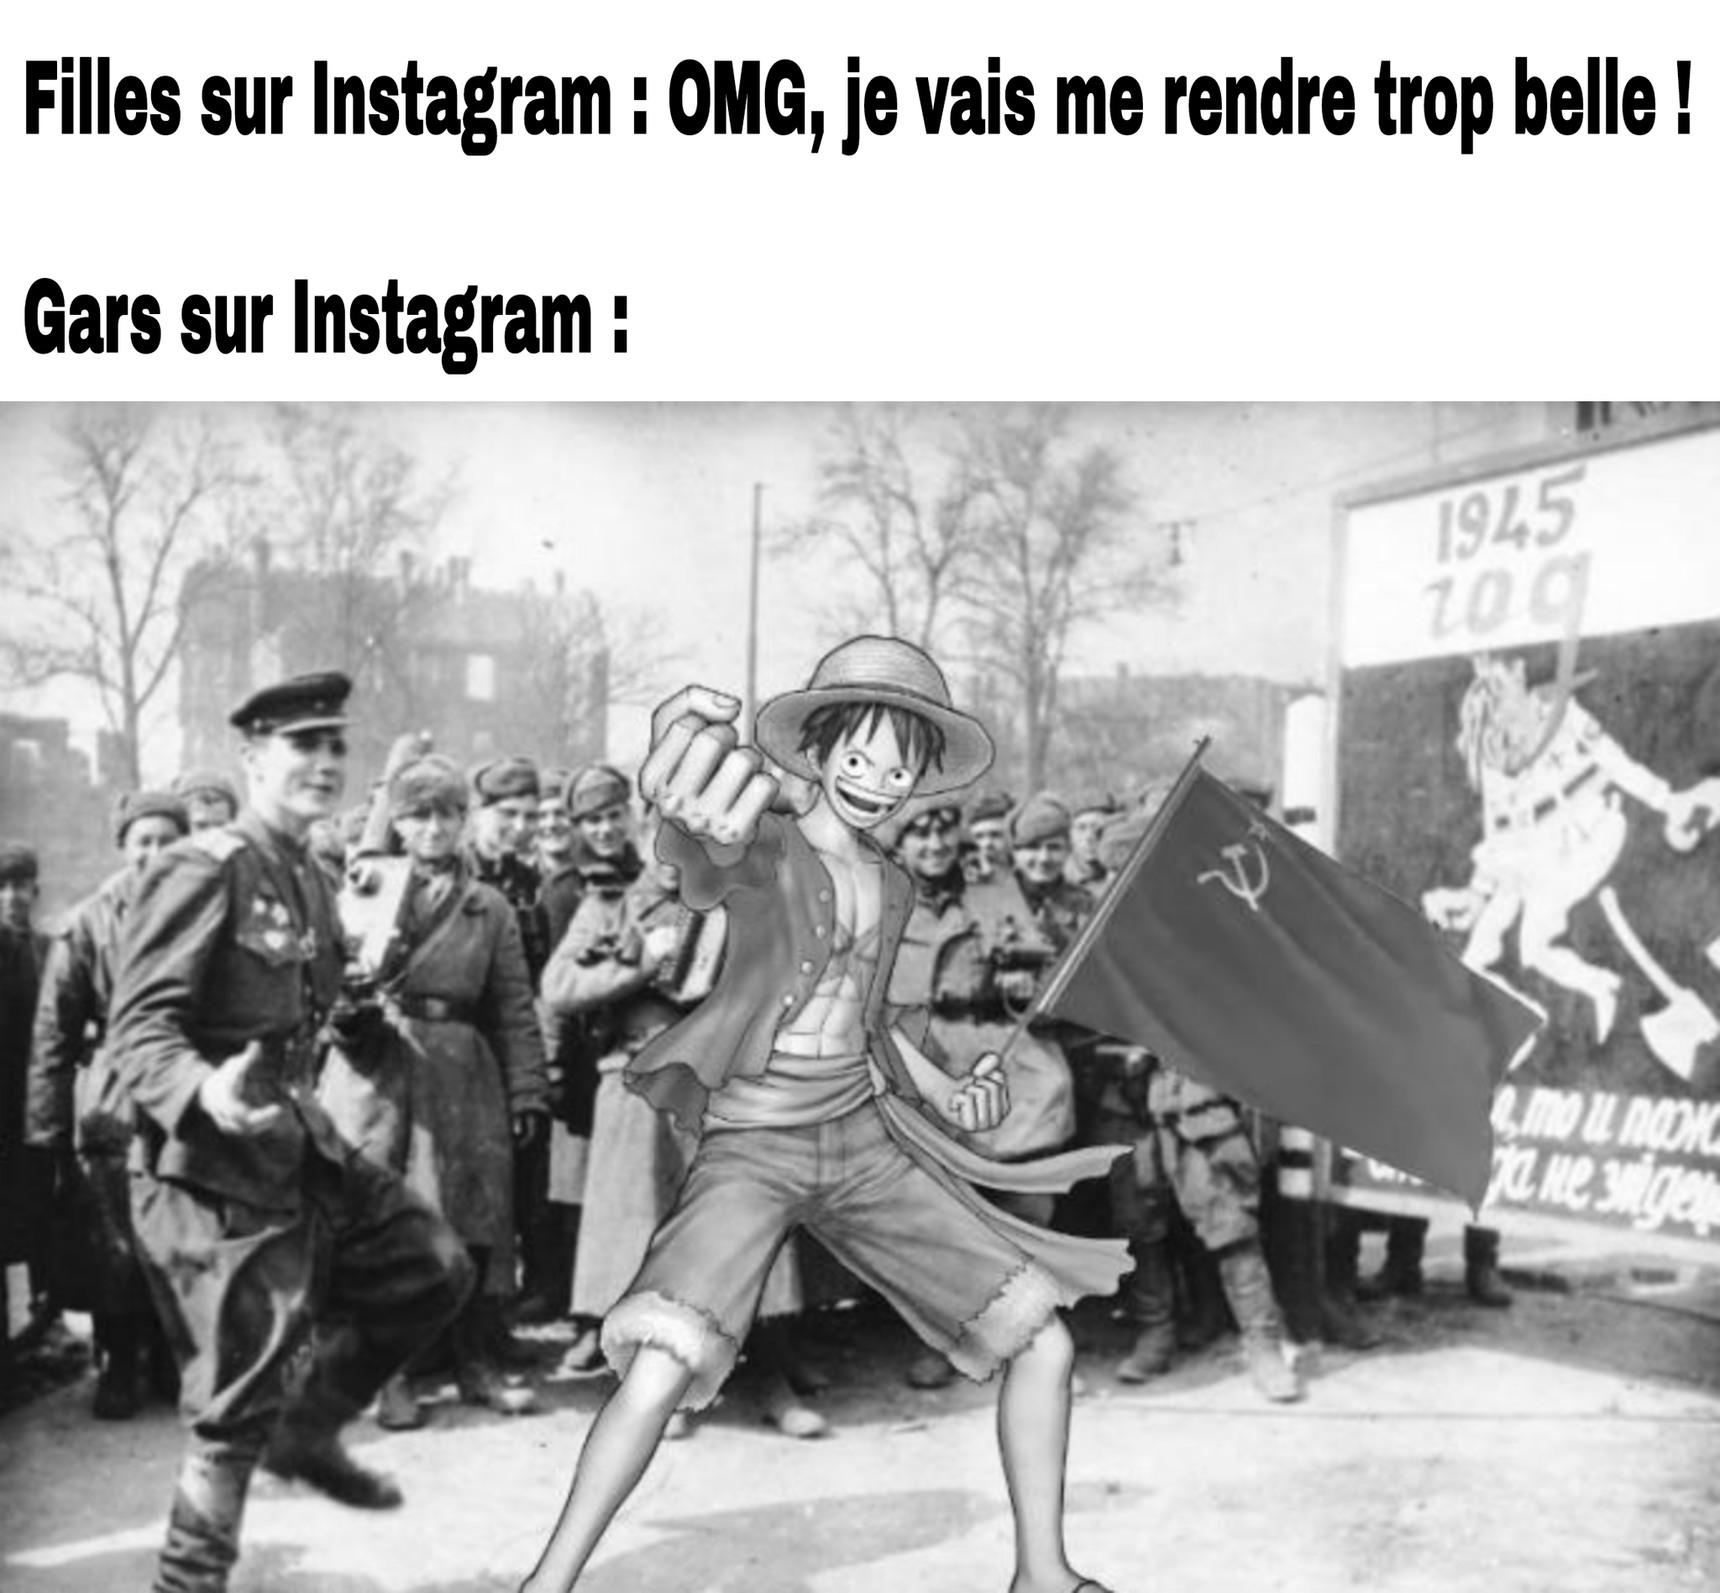 Influenceur - meme